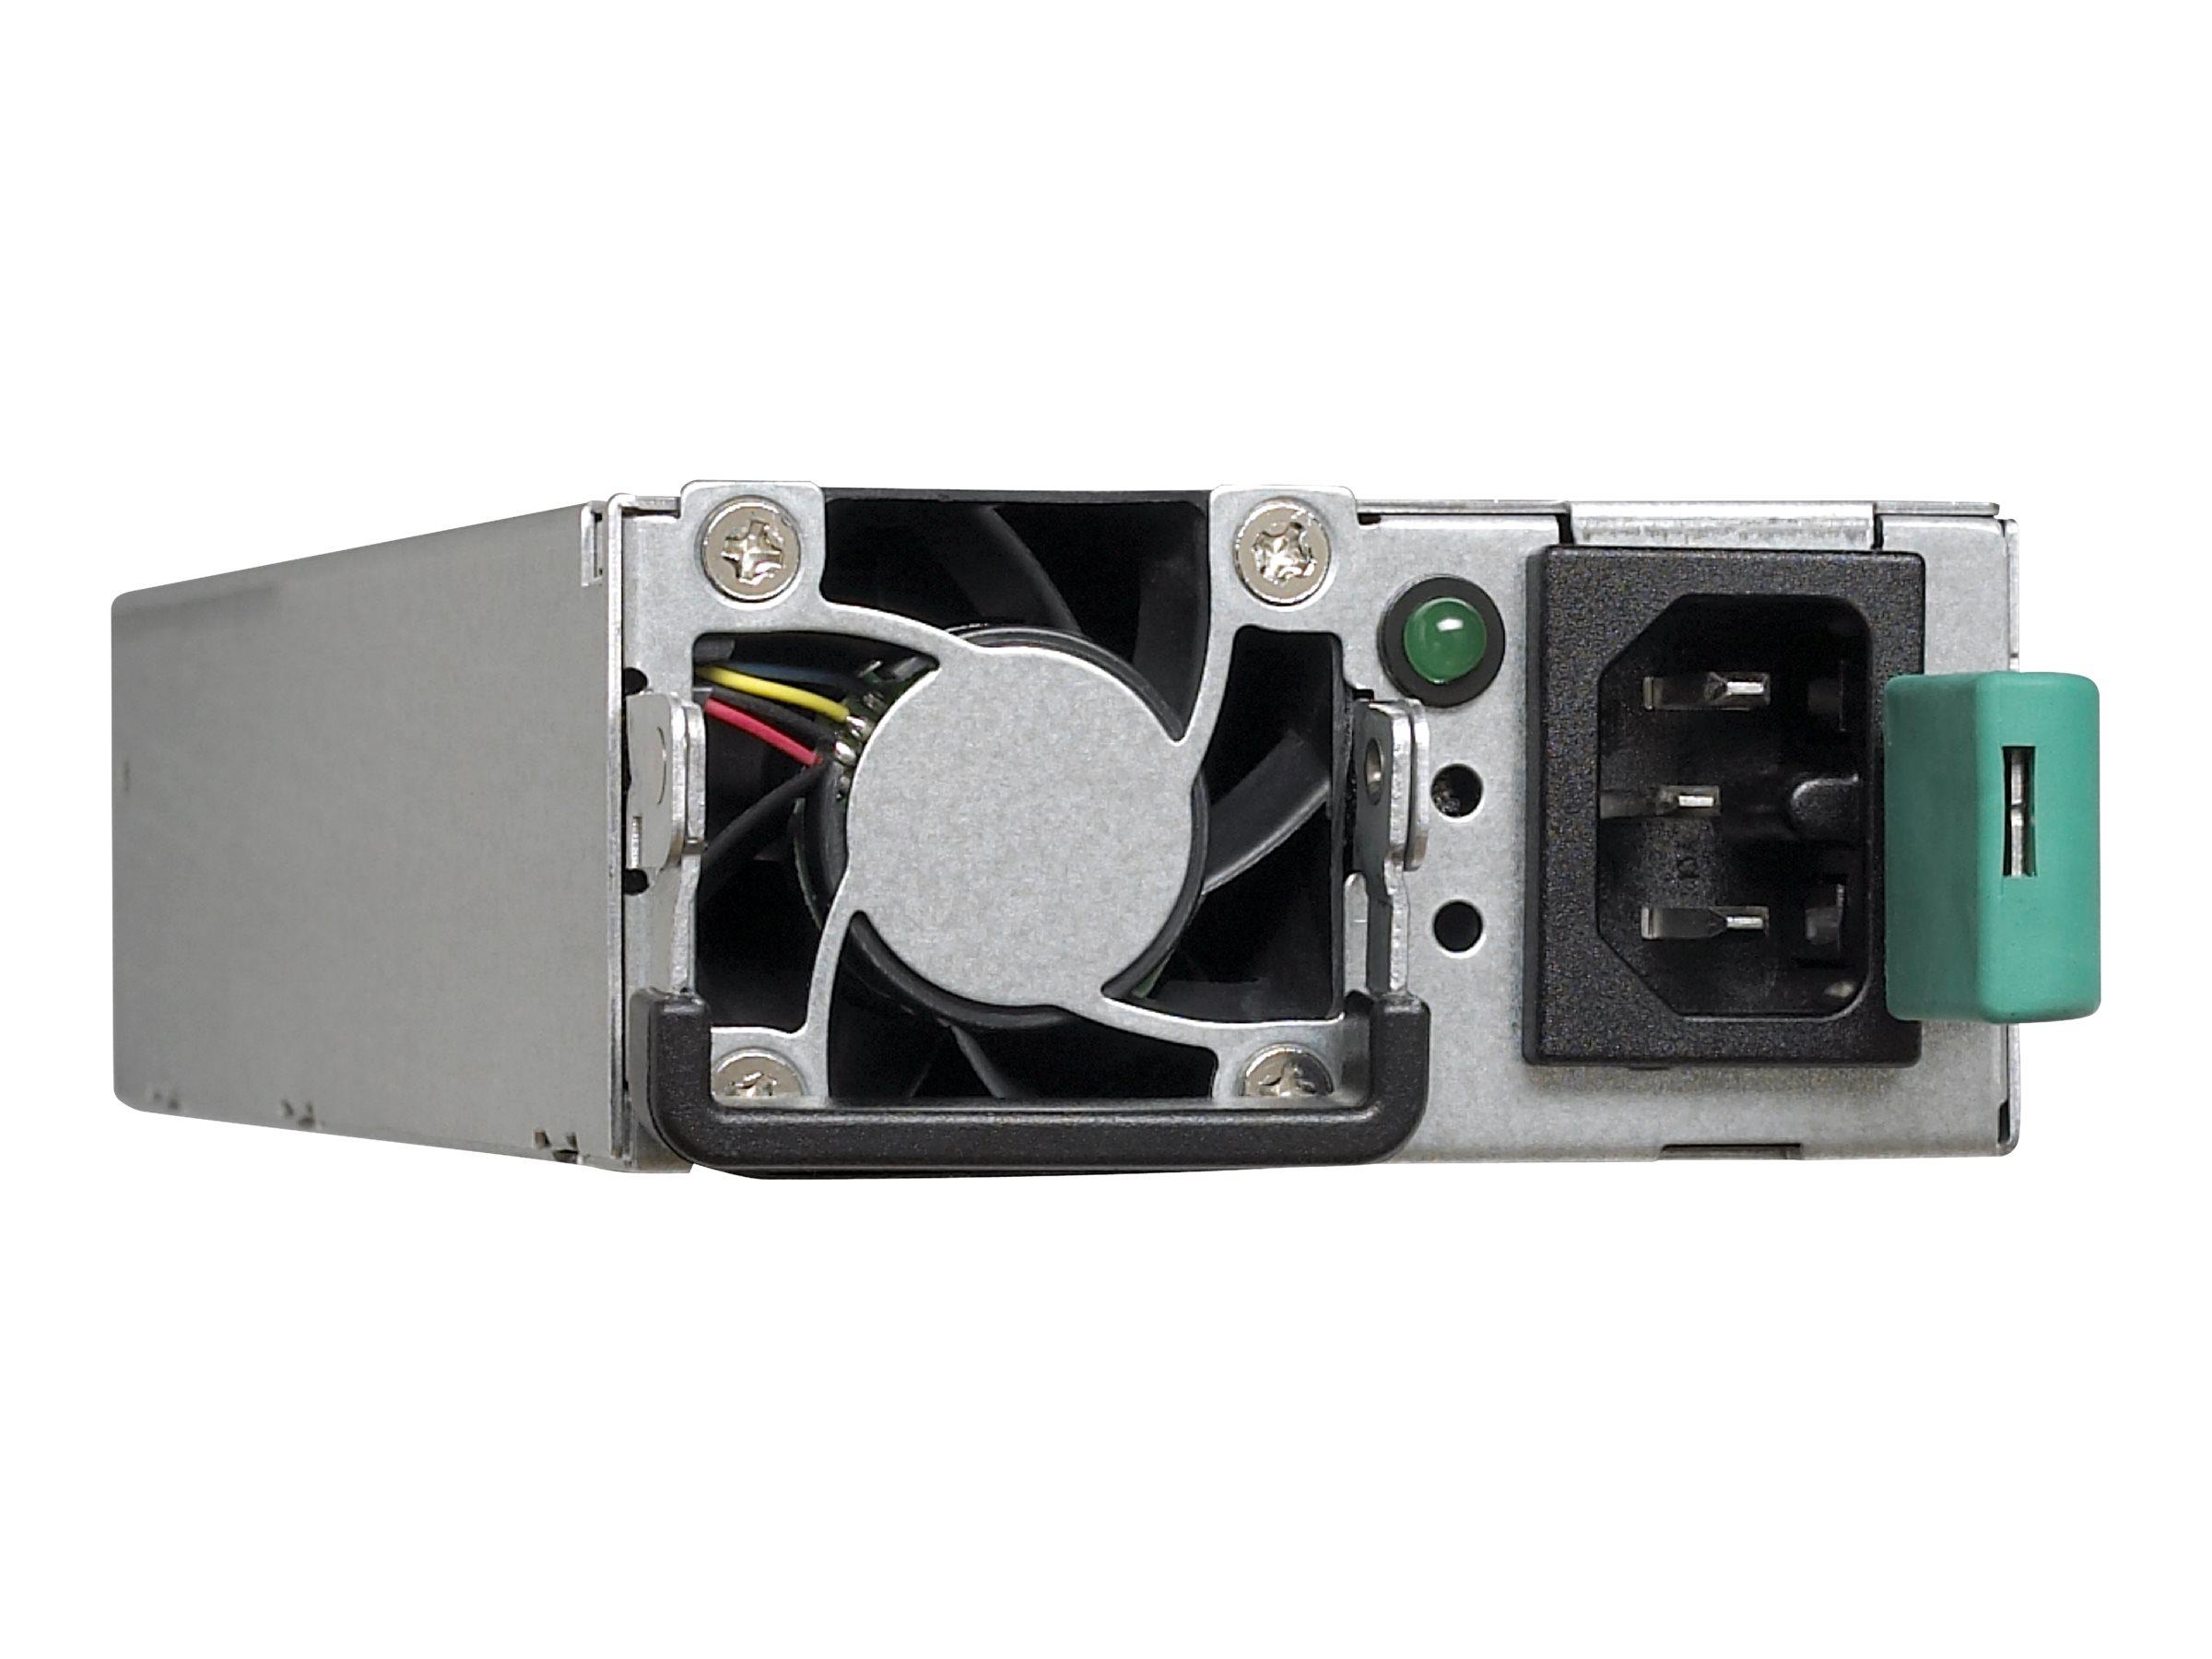 NETGEAR APS1000W - Stromversorgung redundant / Hot-Plug (Plug-In-Modul) - Wechselstrom 110-240 V - 1000 Watt - Europa, Americas